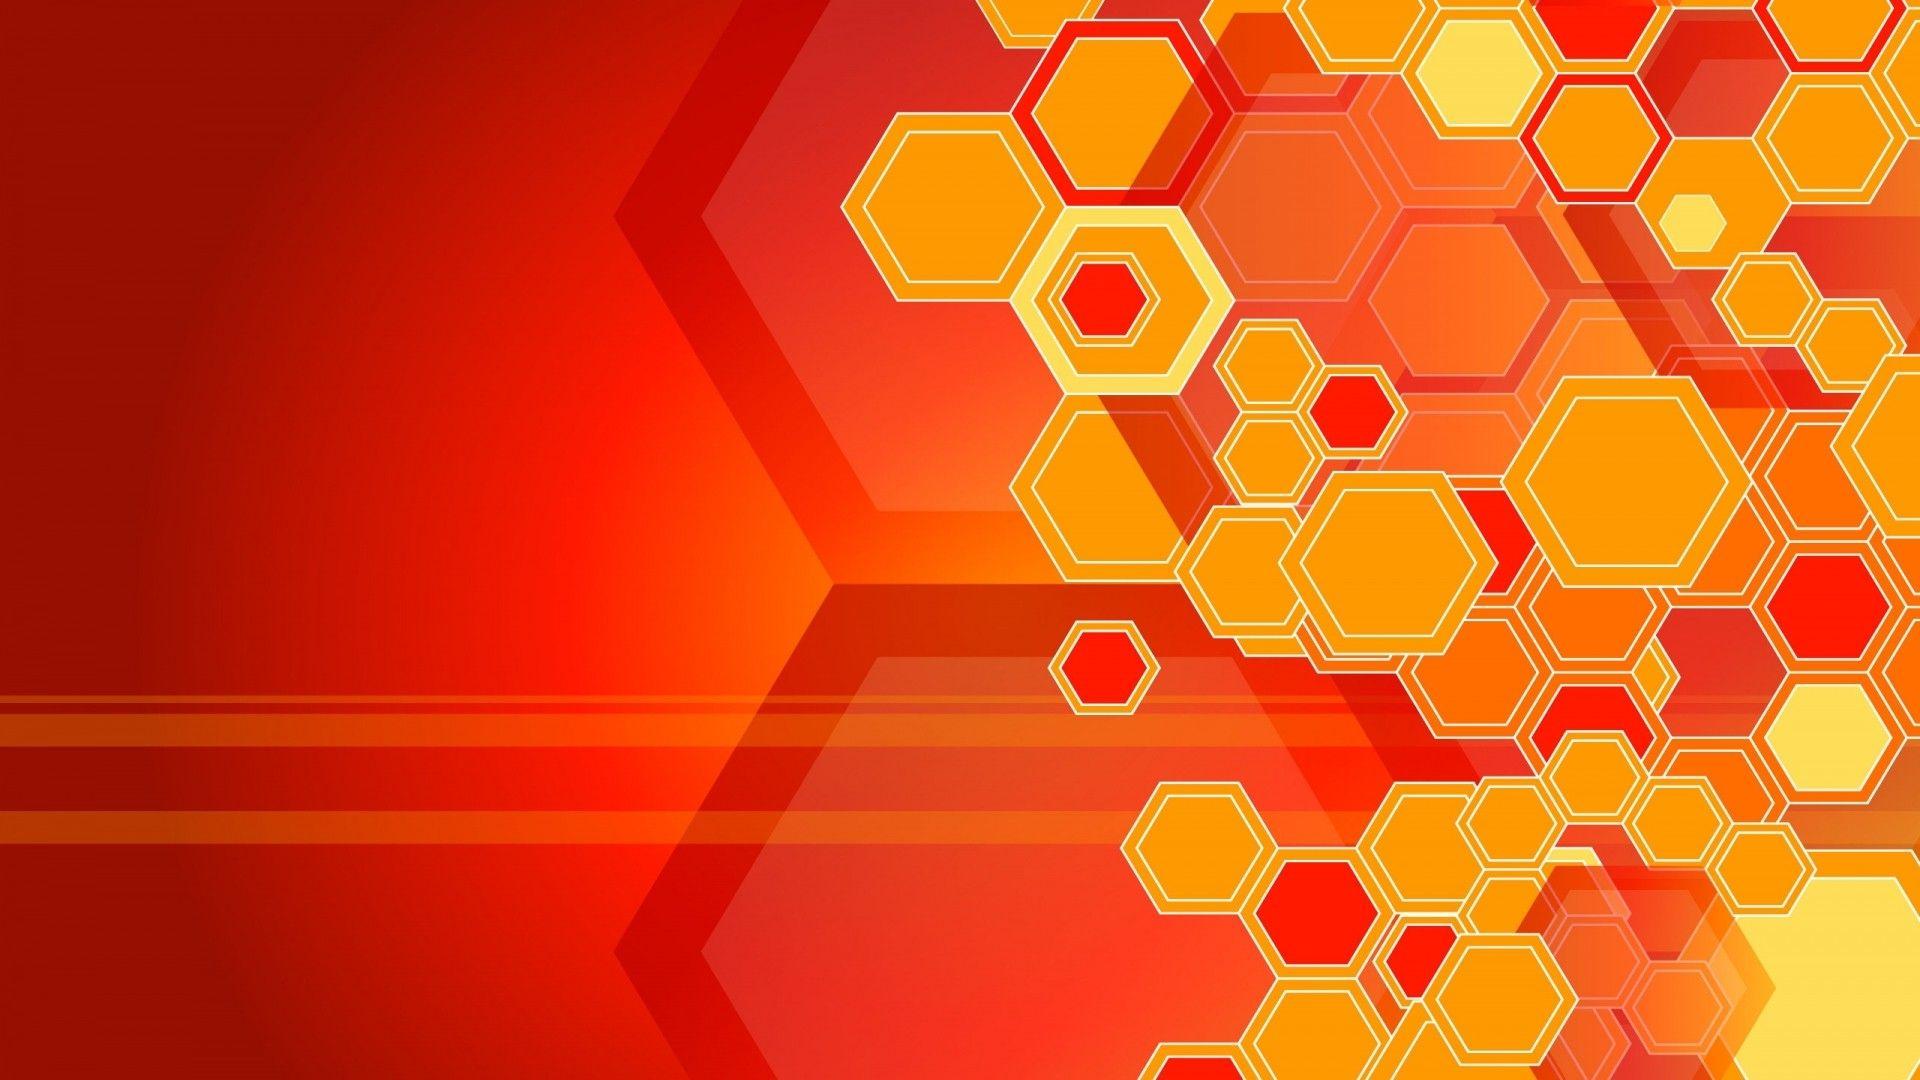 General 1920x1080 Abstract Pattern Digital Art Geometry Orange